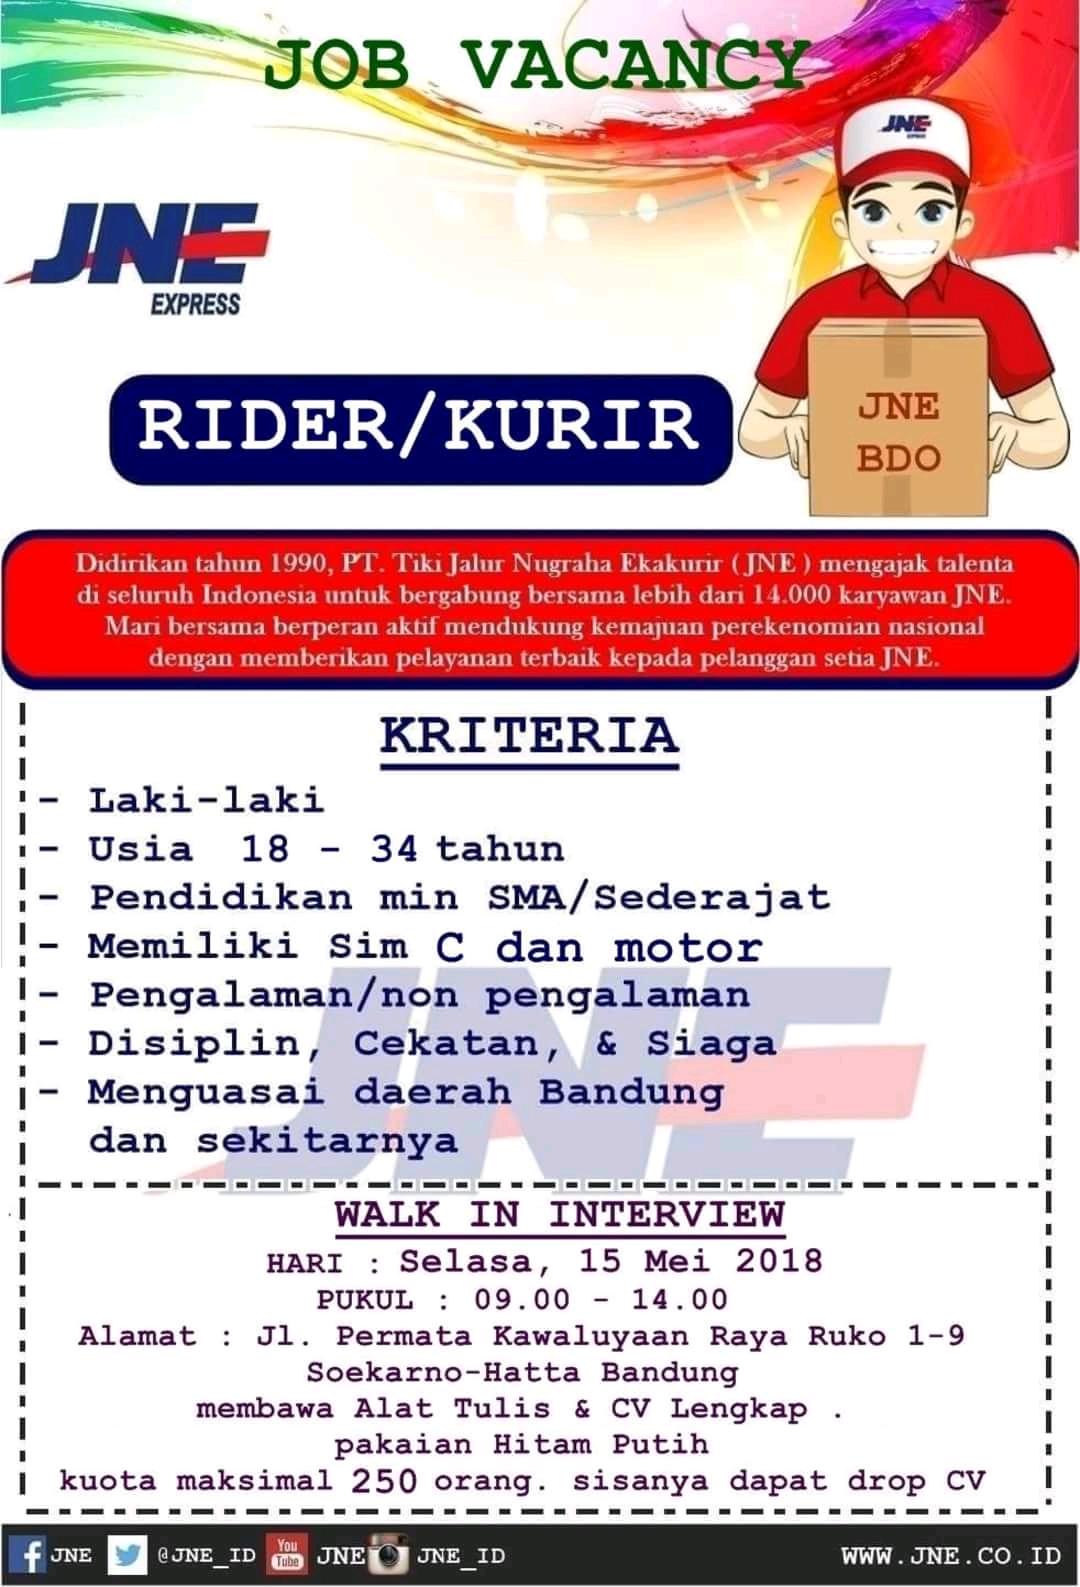 Loker Jne Bandung : loker, bandung, Lowongan, Kerja, Kurir, Bandung, Terupdate, Lowongankerjacareer.com